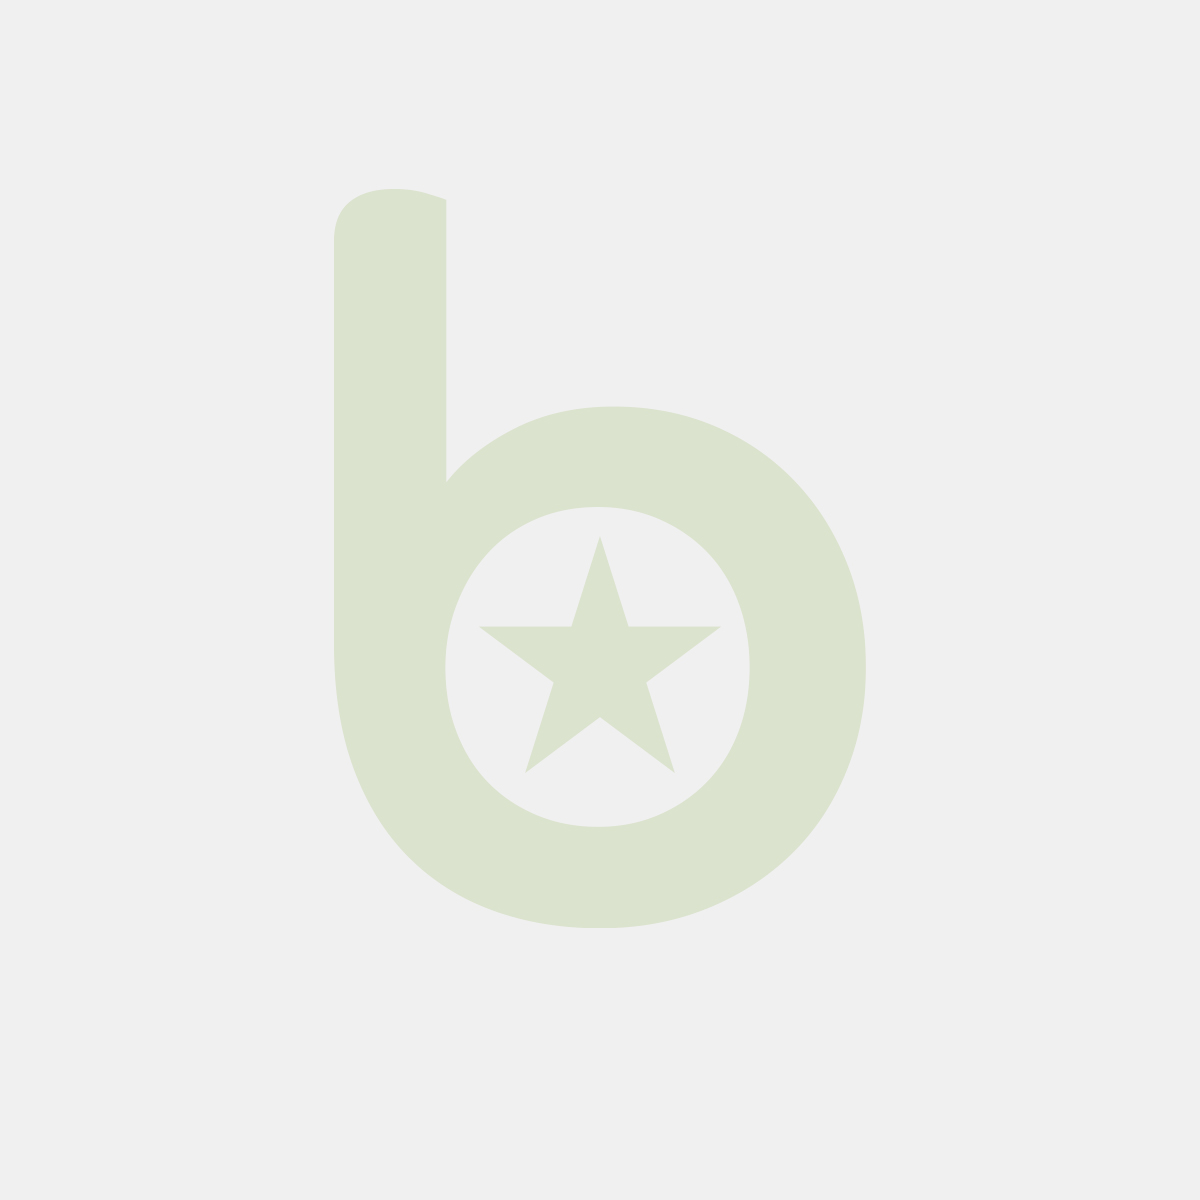 FINGERFOOD - miseczka Jomon Supermini trzcina cukrowa, 8,7x7,5x3,4cm, op. 25 sztuk